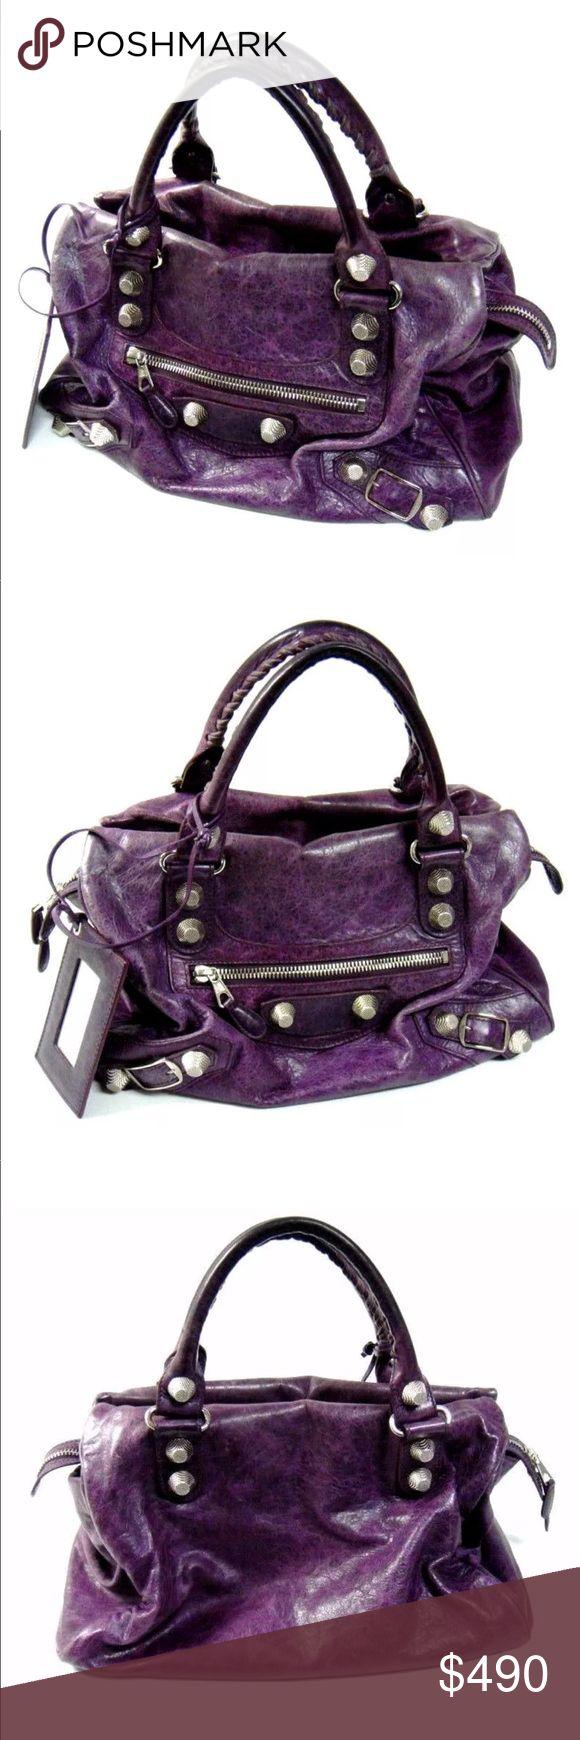 Balenciaga giant city bag purple 💯 authentic Balenciaga giant city purple bag! Good condition! Comes with original dustbag 💖 Balenciaga Bags Satchels